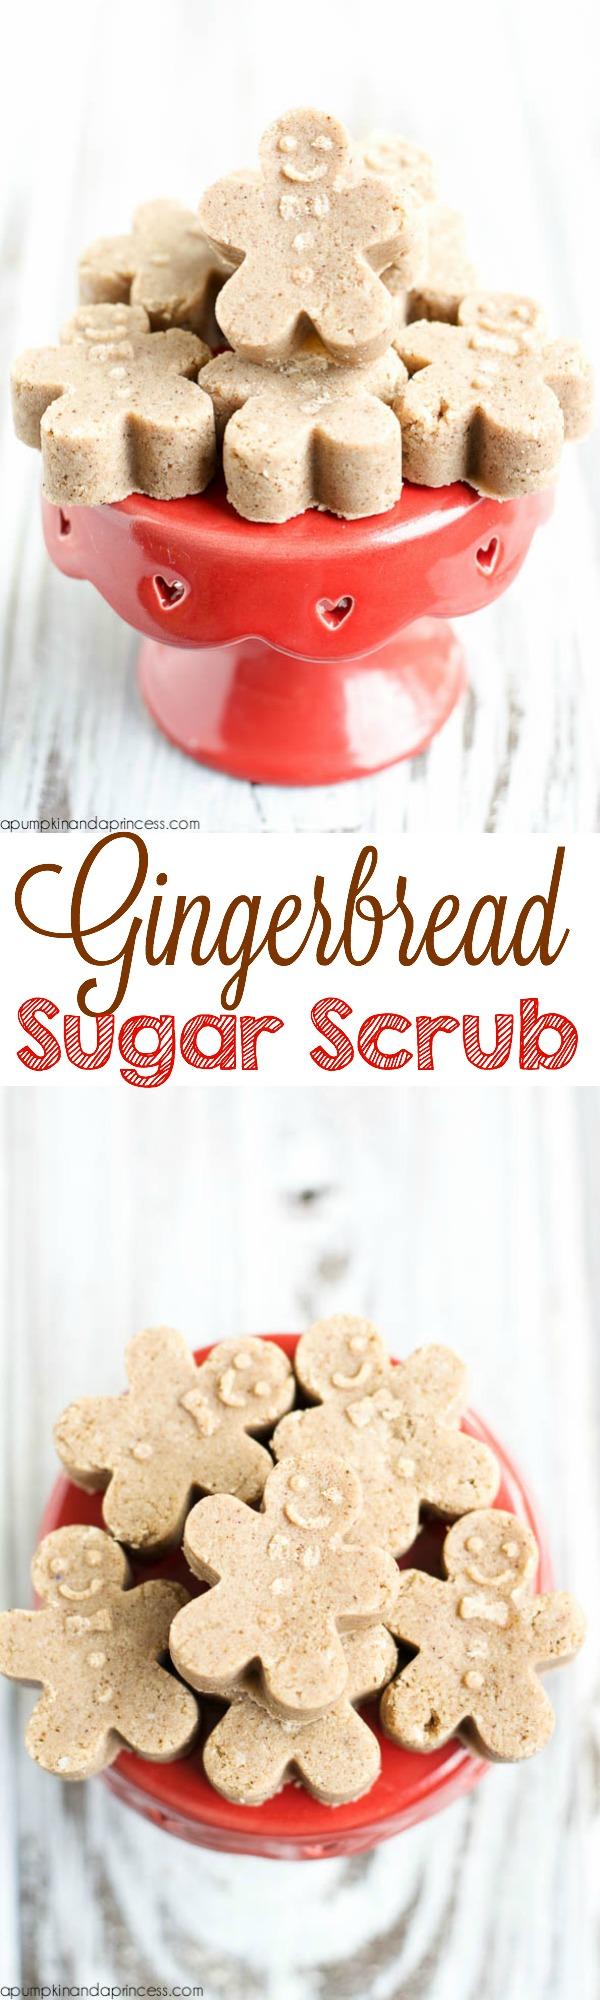 Gingerbread sugar scrub cubes